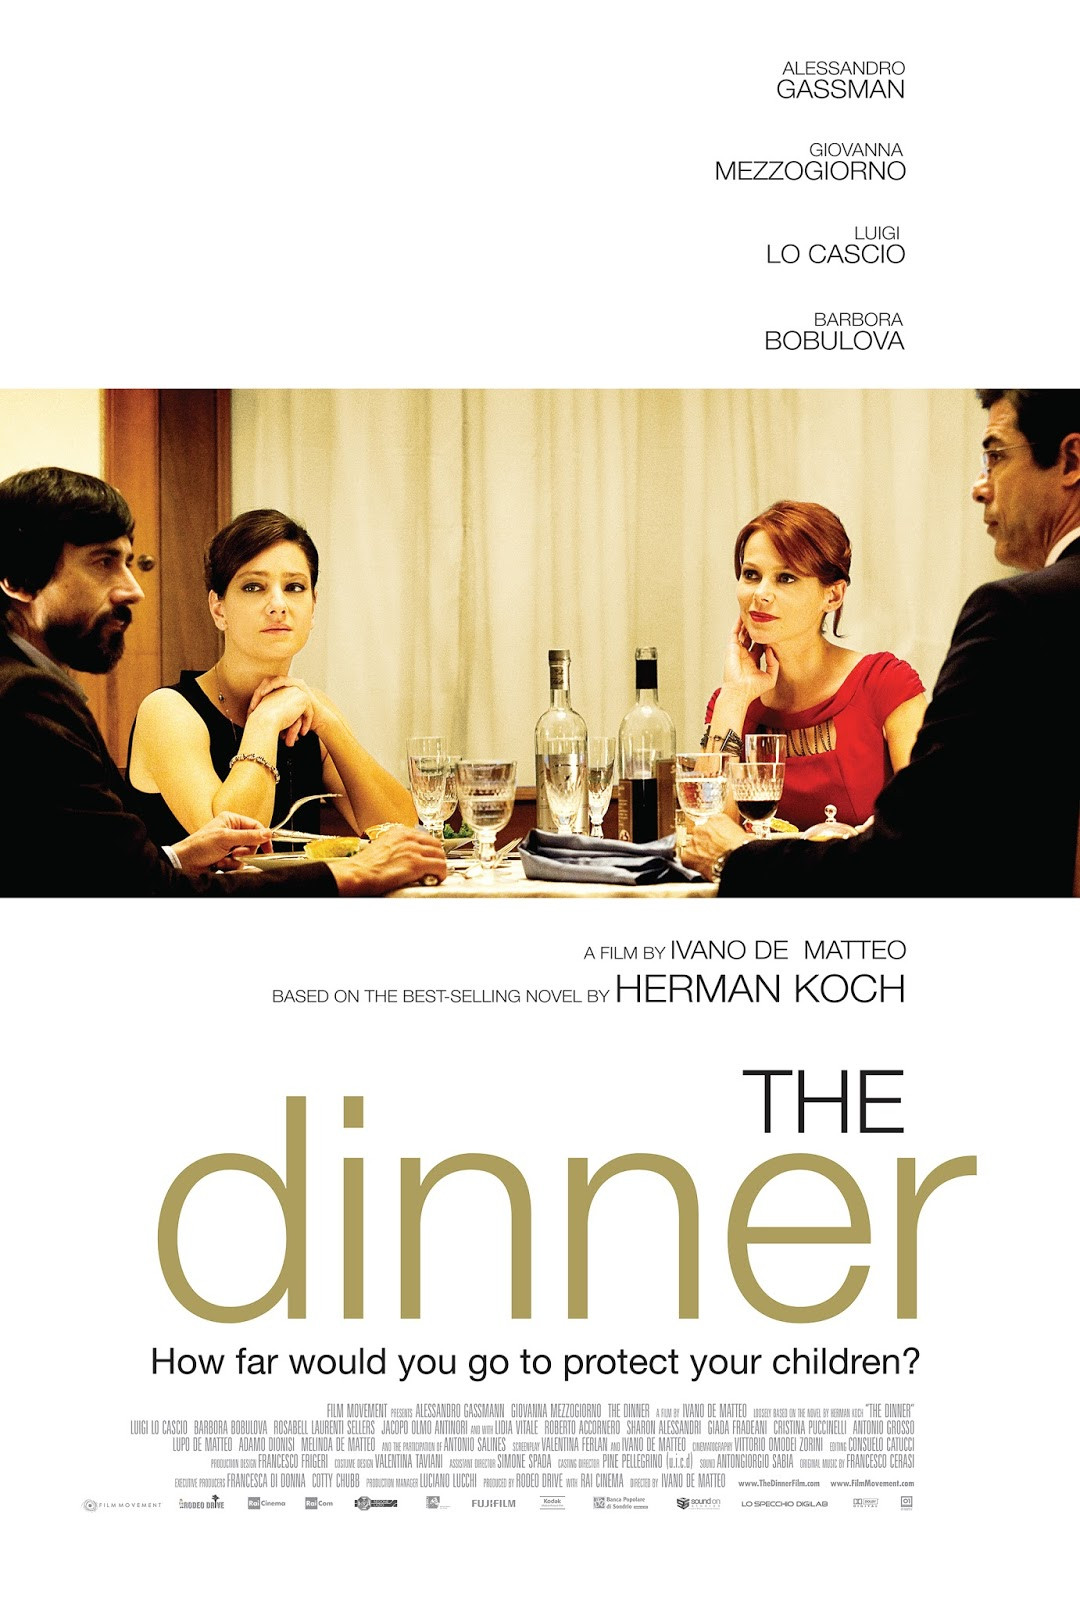 The Dinner Imdb  TrustMovies Ivano de Matteo s screen version of Herman